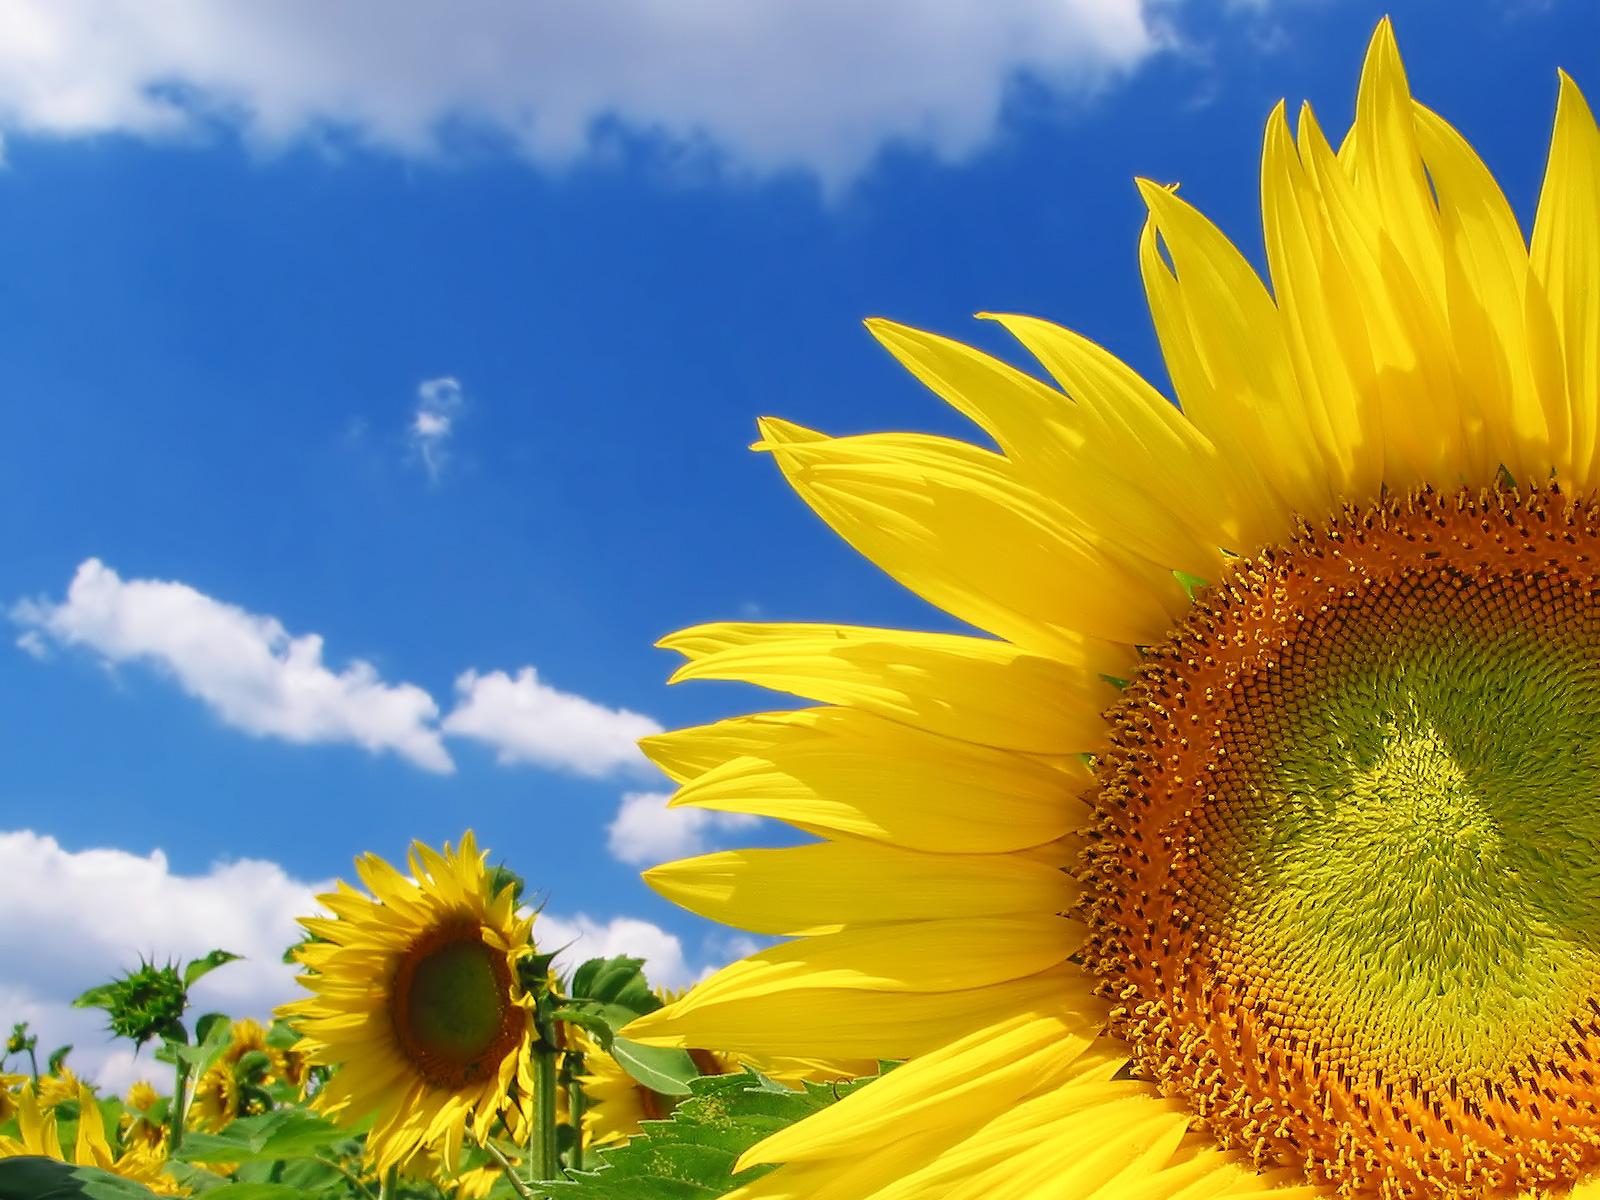 wallpaper bunga matahari tercantik foto bunga matahari tercantik gambar